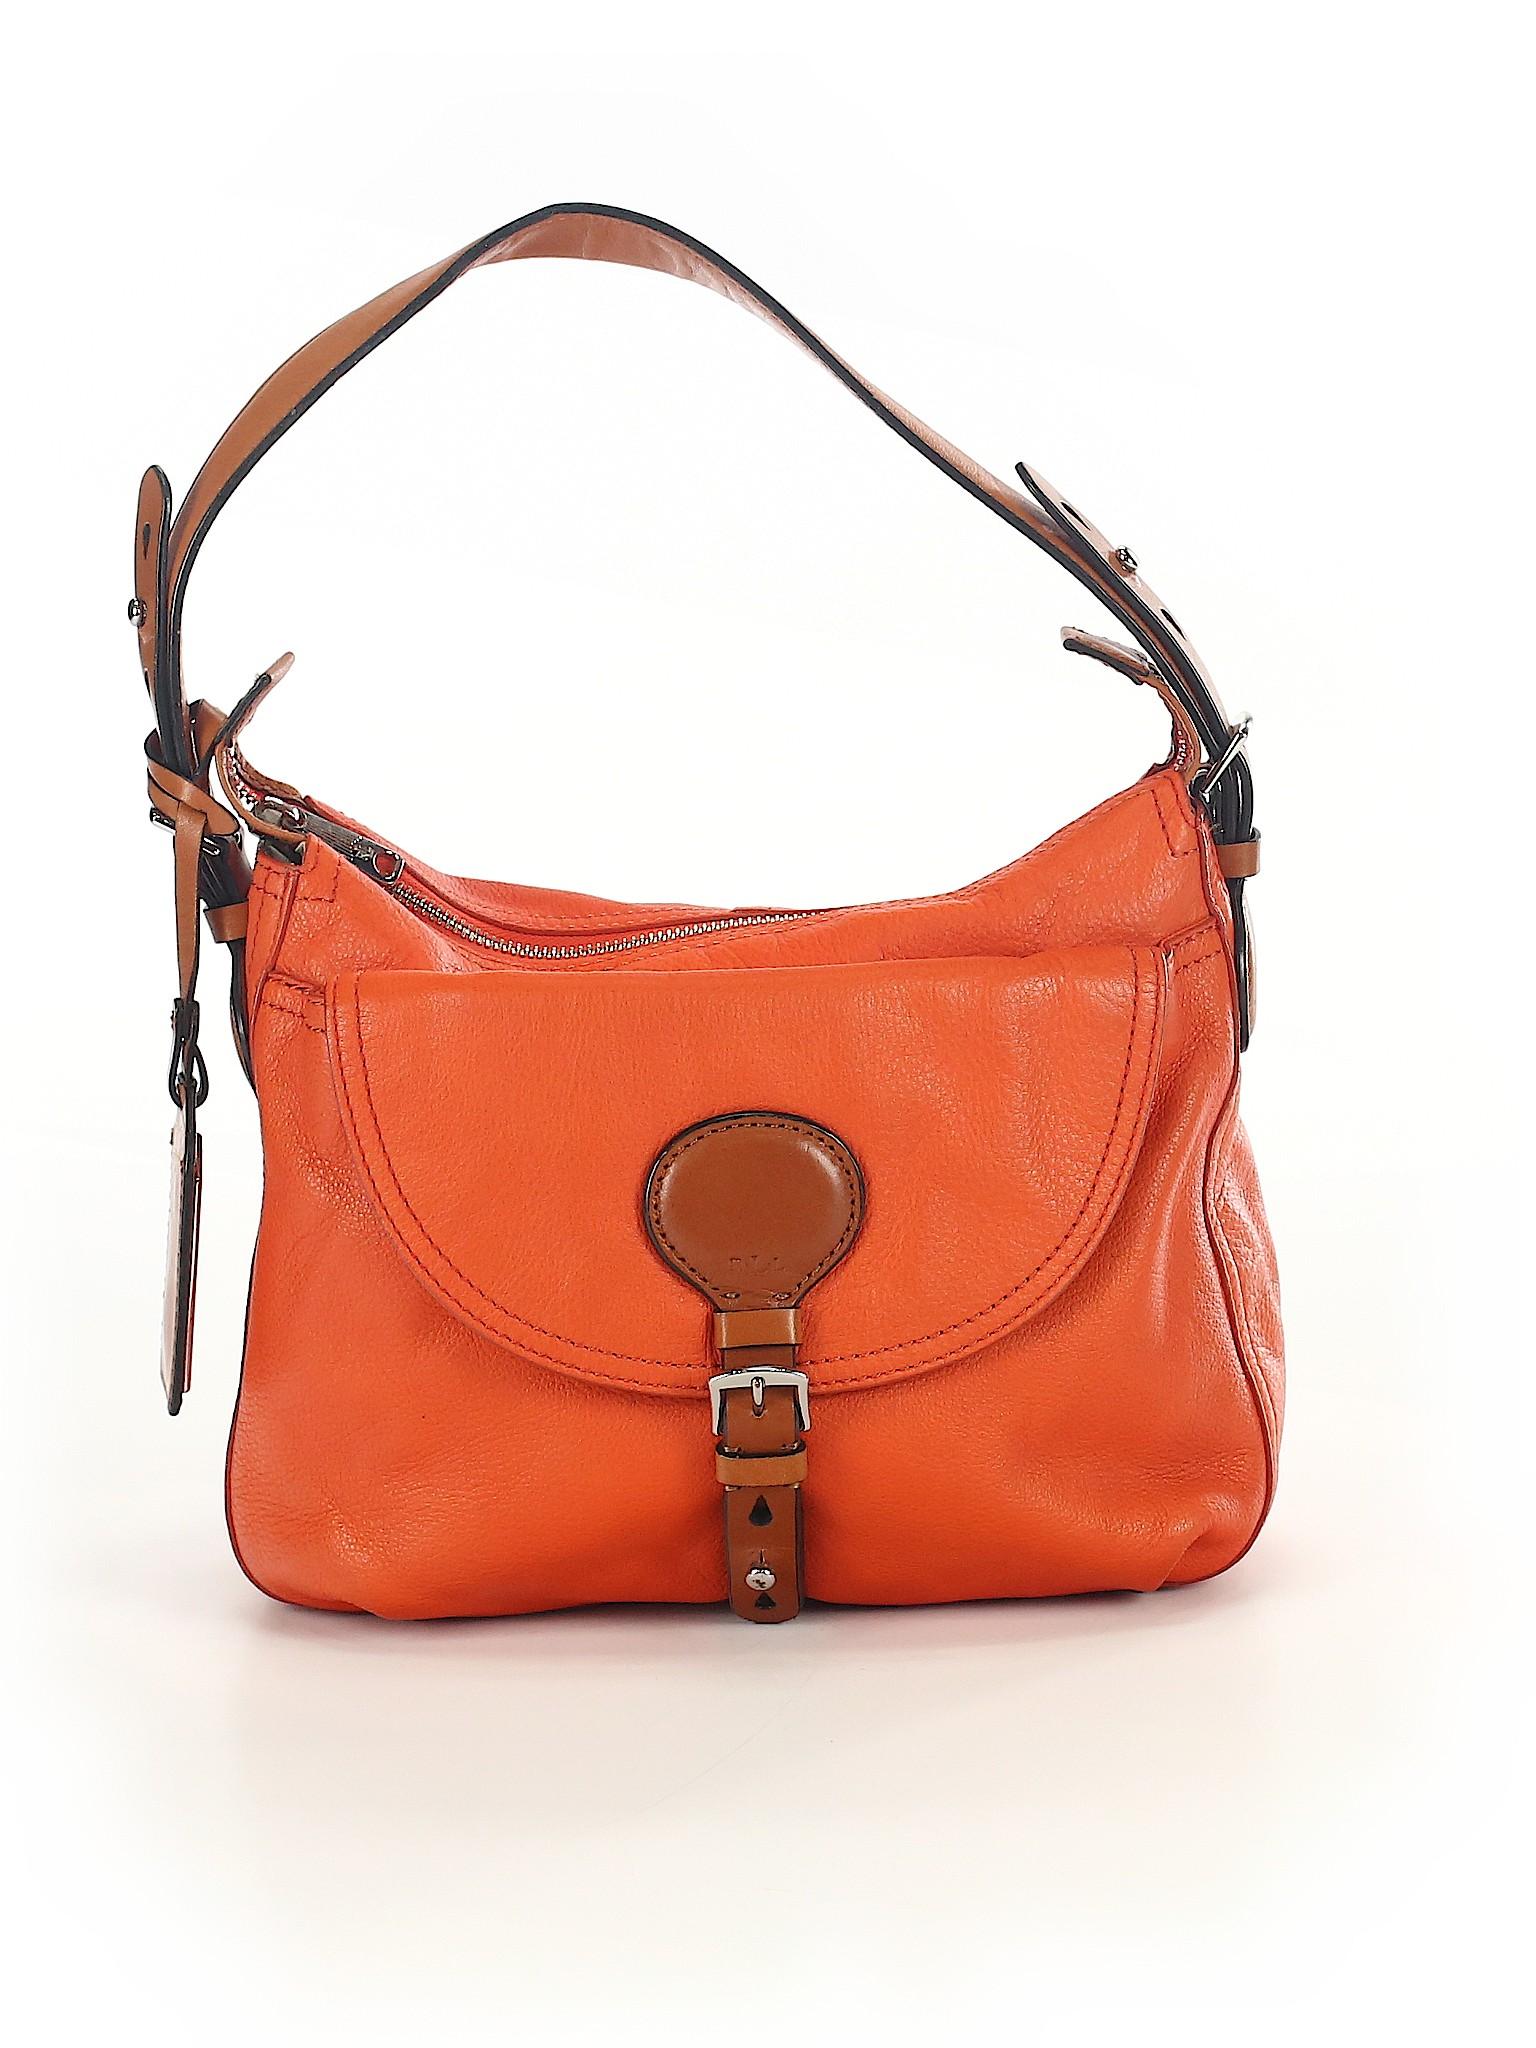 Lauren by Ralph Lauren 100% Leather Solid Orange Leather Shoulder ... df201bb4b0507